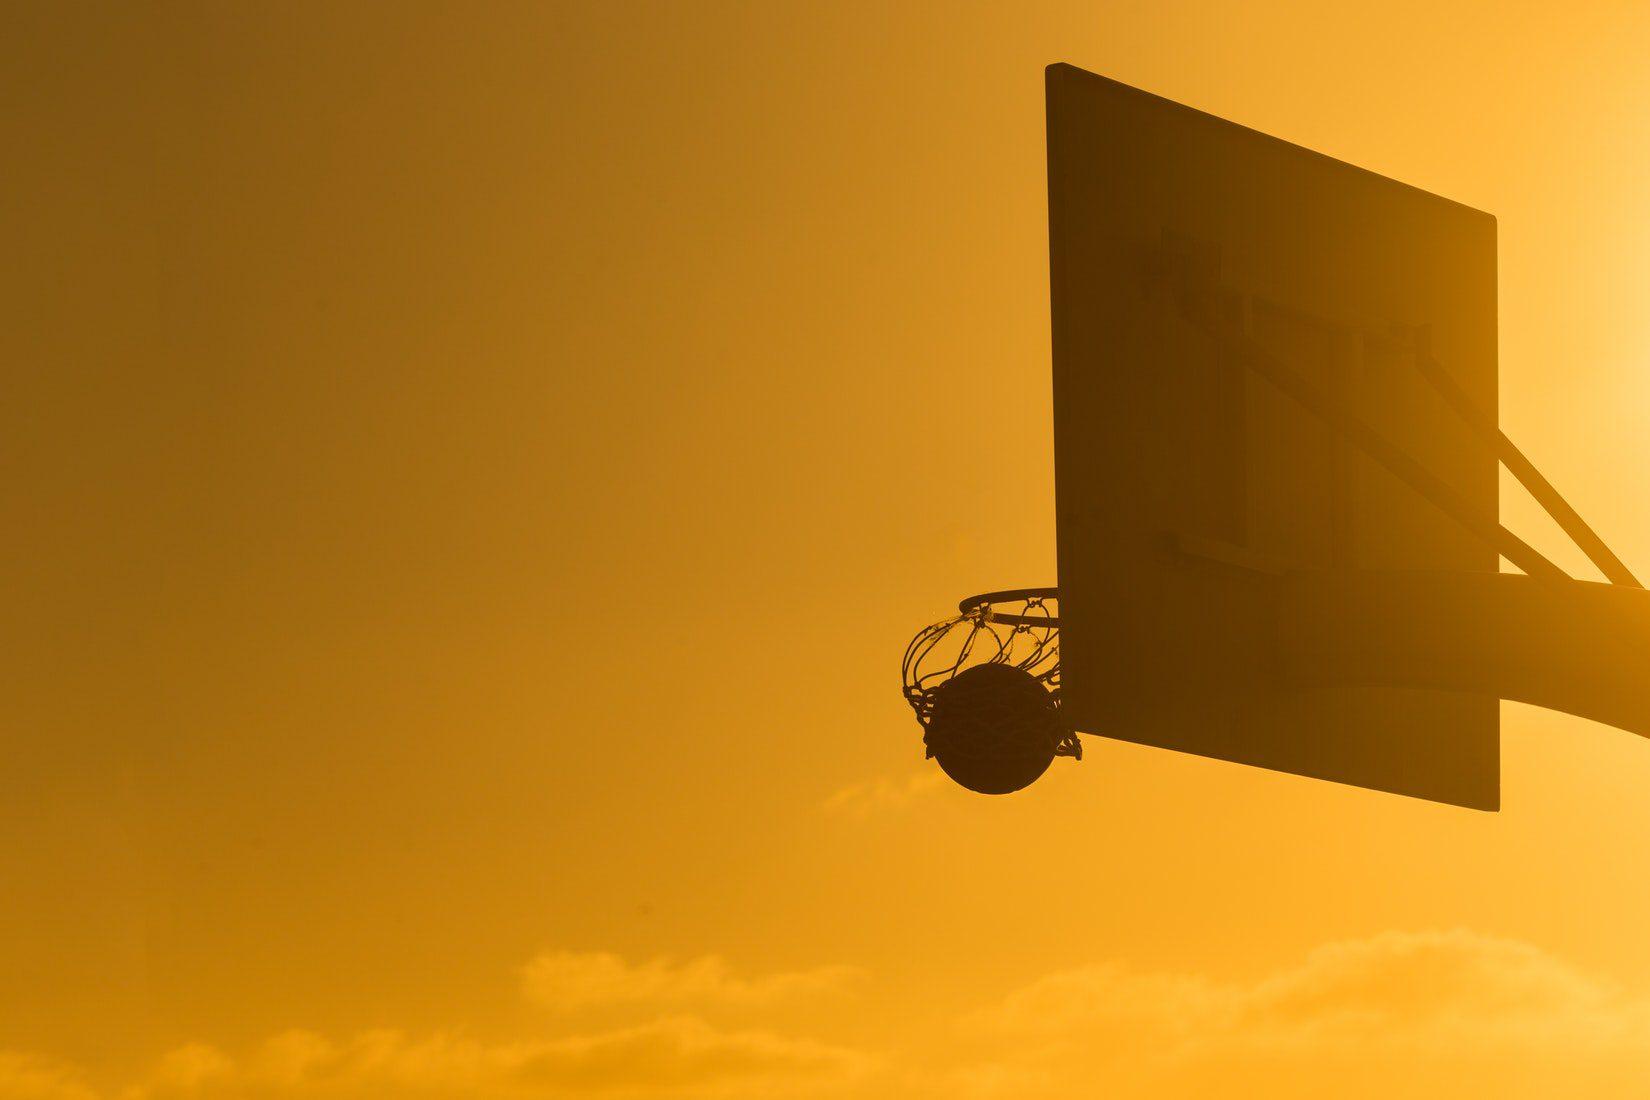 benefits of basketball